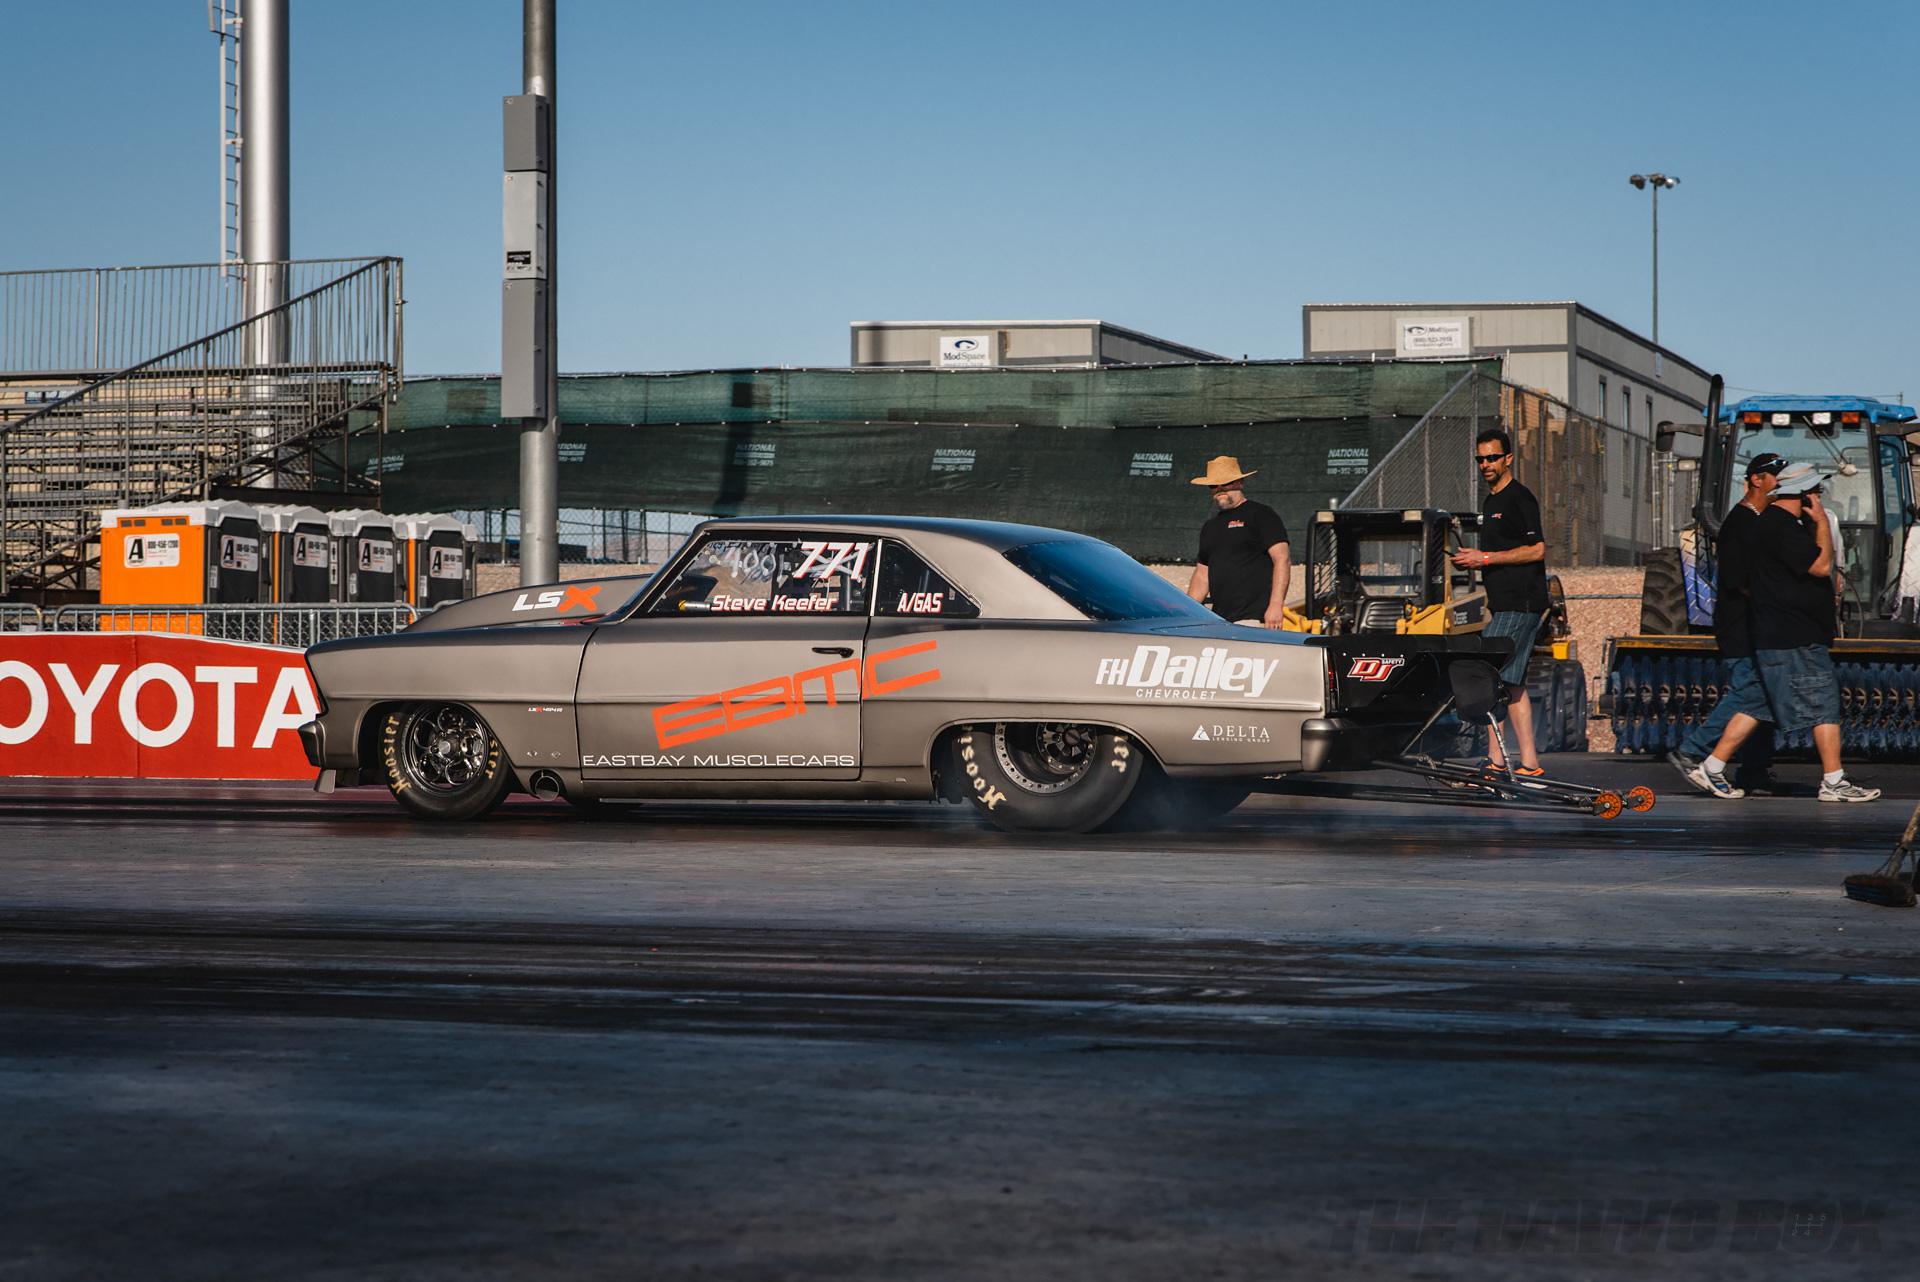 Chevy Impala drag car